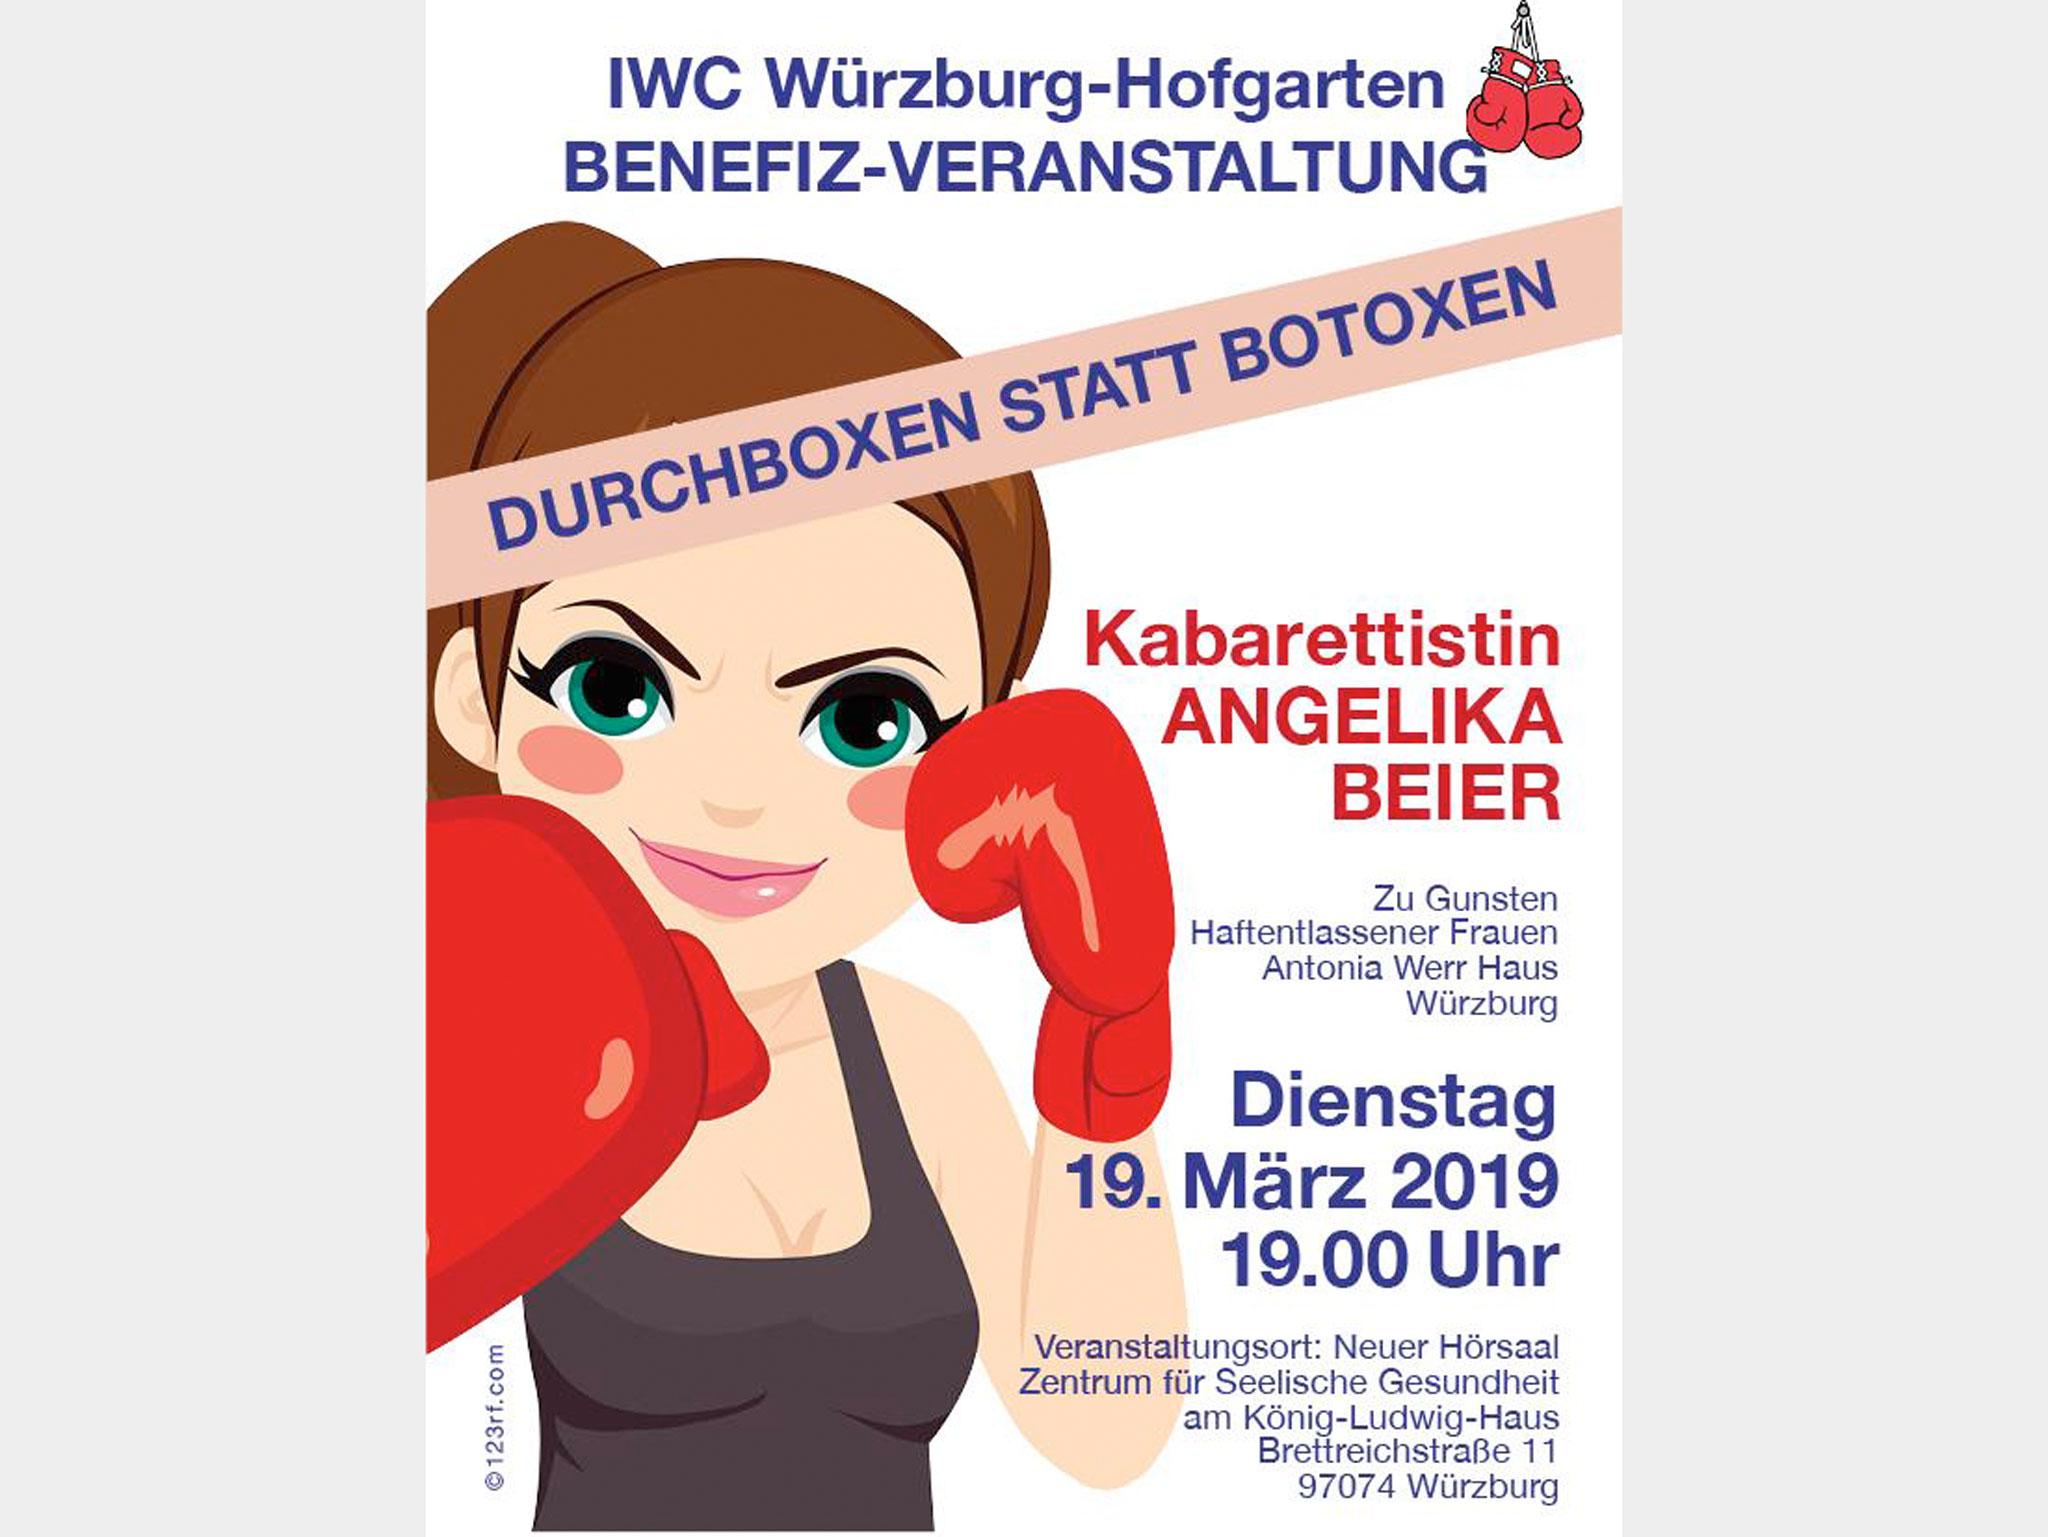 Grafik: Inner Wheel Club Würzburg-Hofgarten